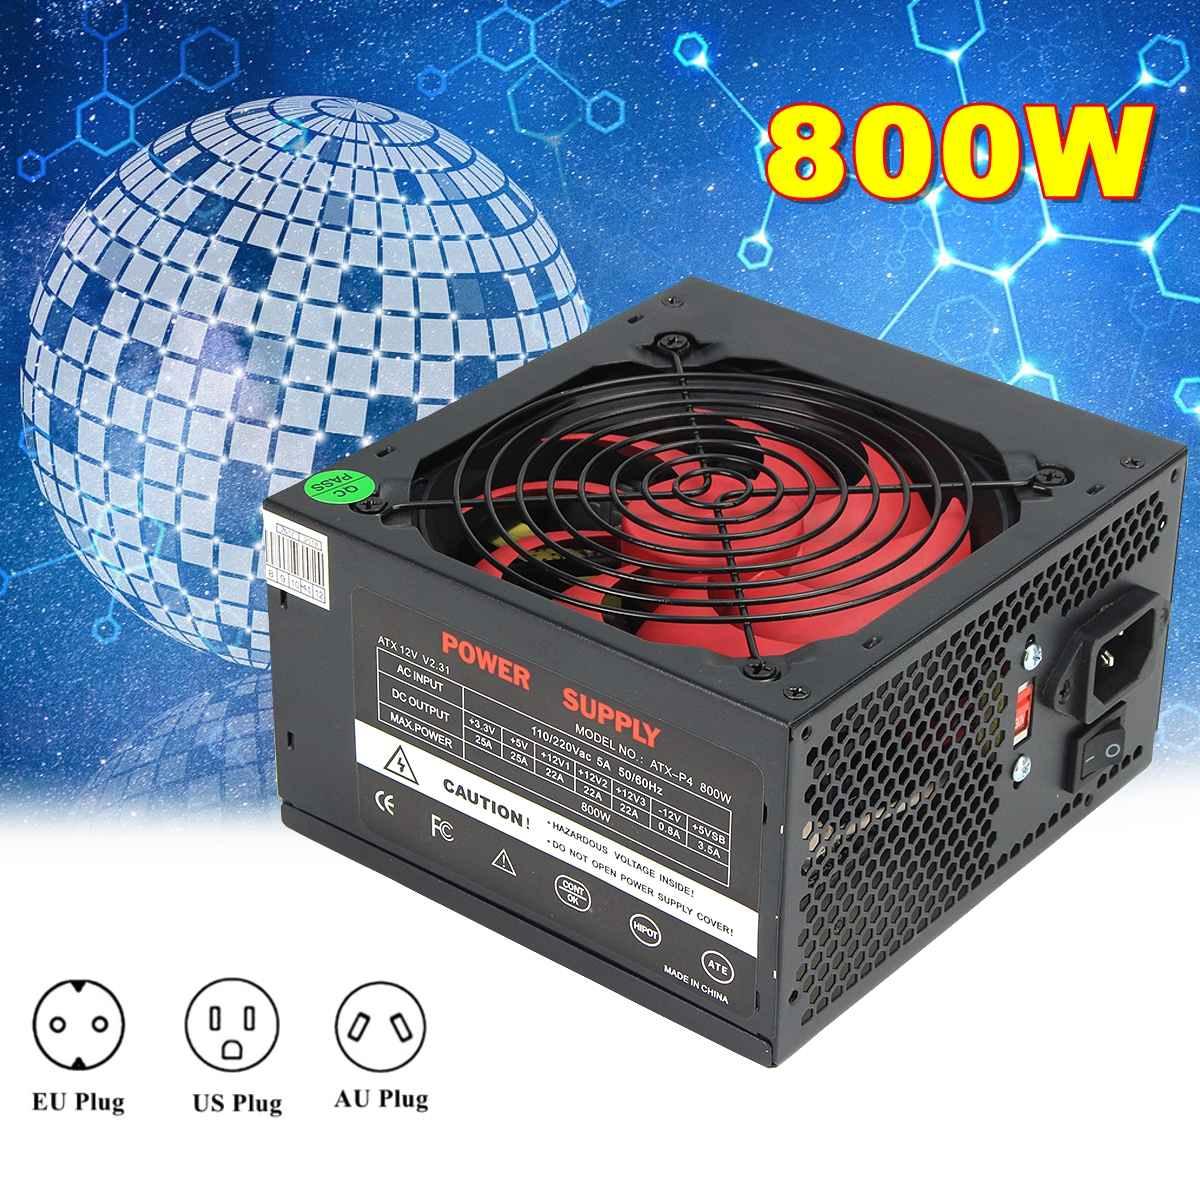 Black 800W 800 Watt Power Supply 120mm Fan 24 Pin PCI SATA ATX 12V Molex Connect Computer Power Supply 80+Gold